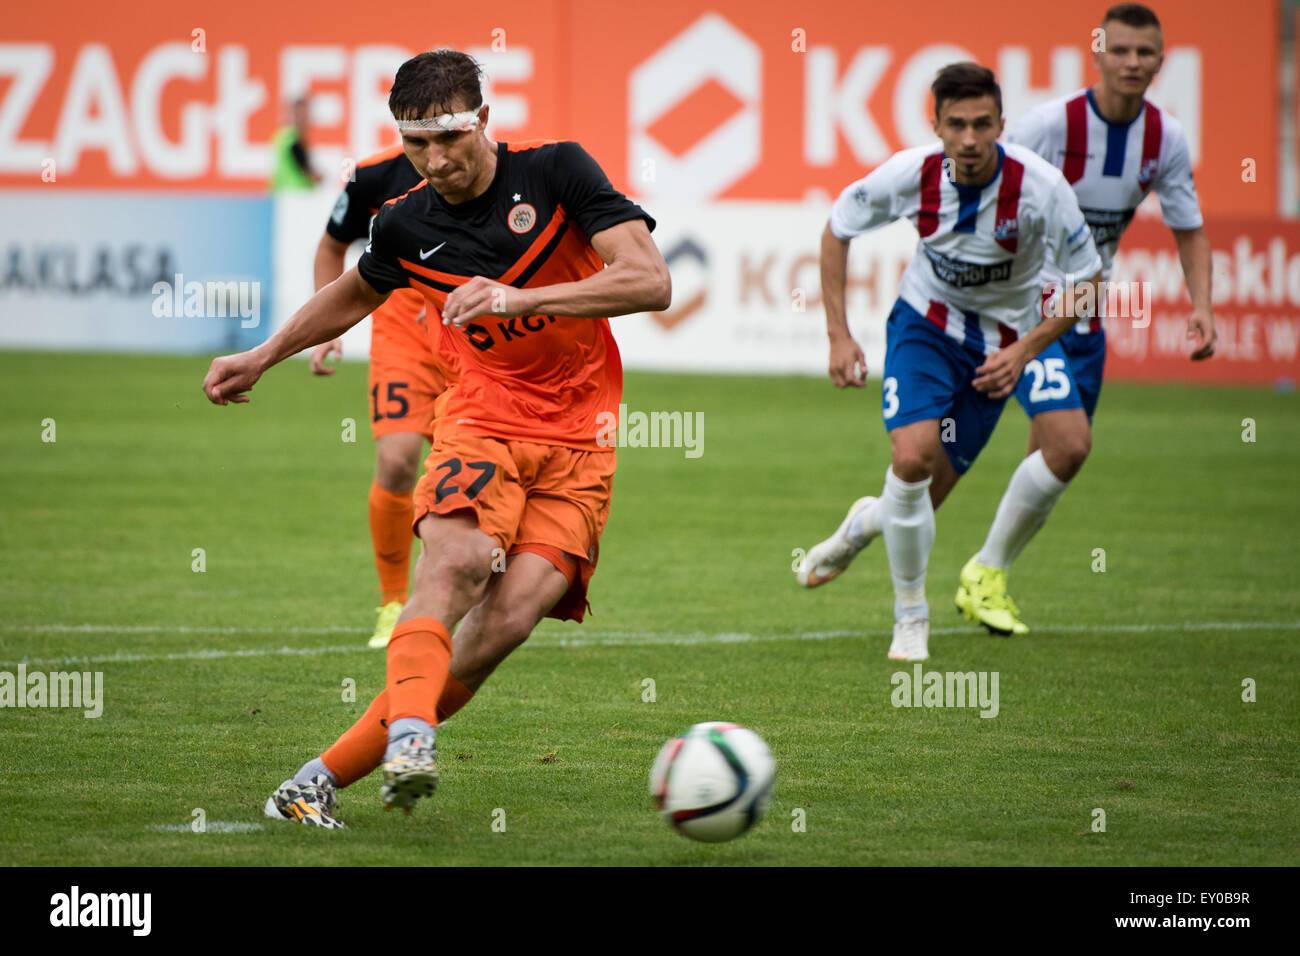 Lubin, Poland. 18th July, 2015, Michal Papadopulos shot penalty kick during match Polish Premier League betwen KGHM - Stock Image